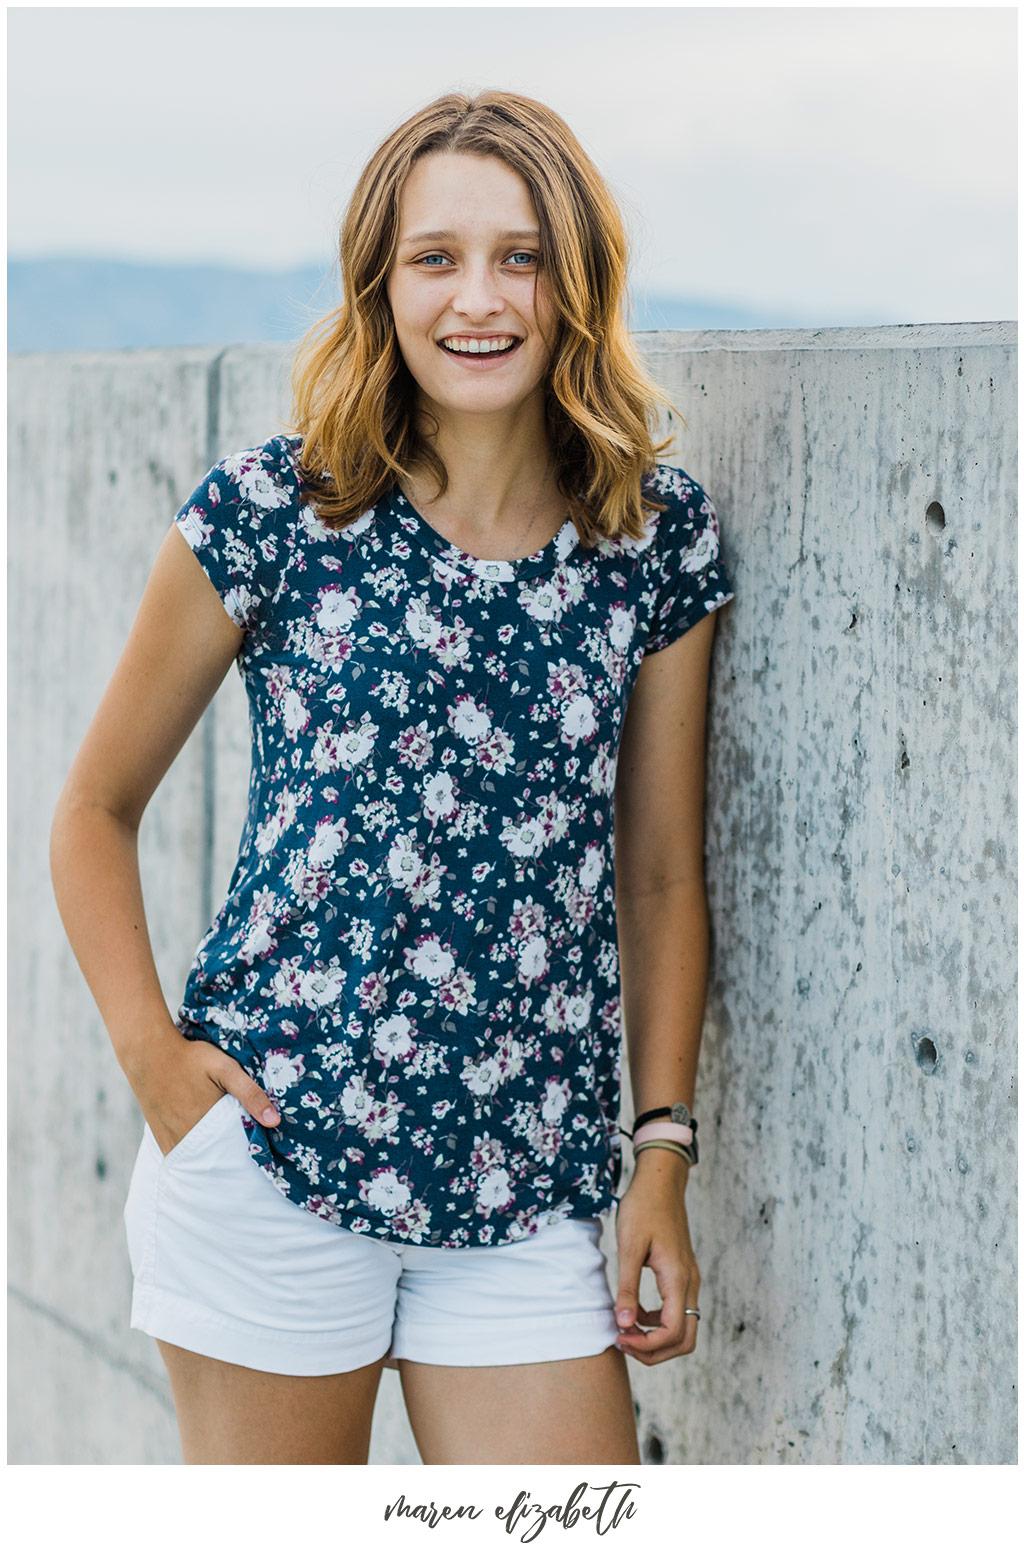 Portraits by Maren Elizabeth Photography taken on the top level of the Utah Valley University parking garage. | Arizona Senior Photographer